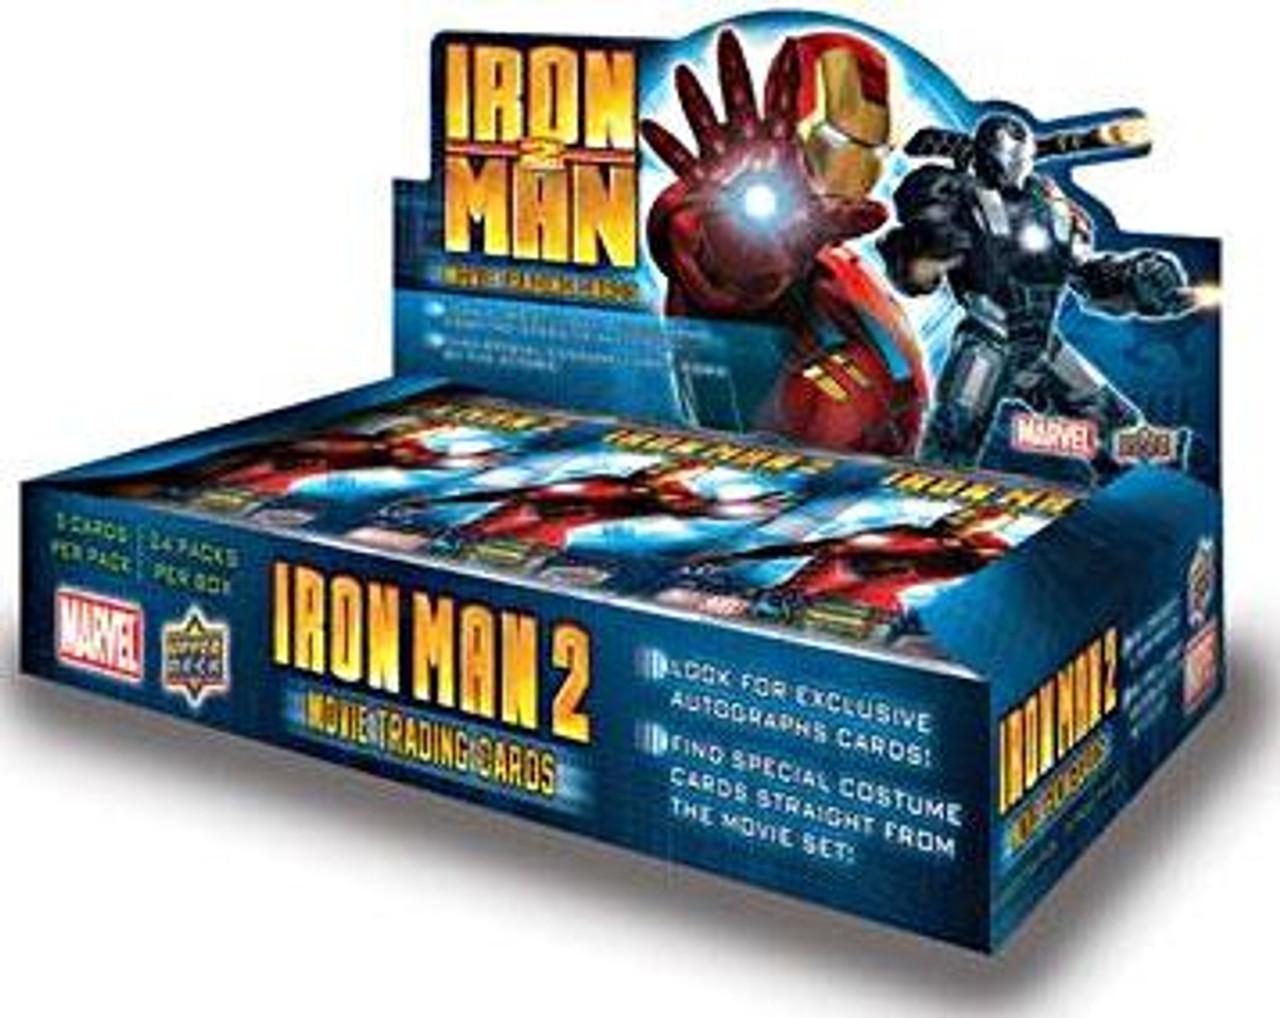 Iron Man 2 Movie Trading Card Box